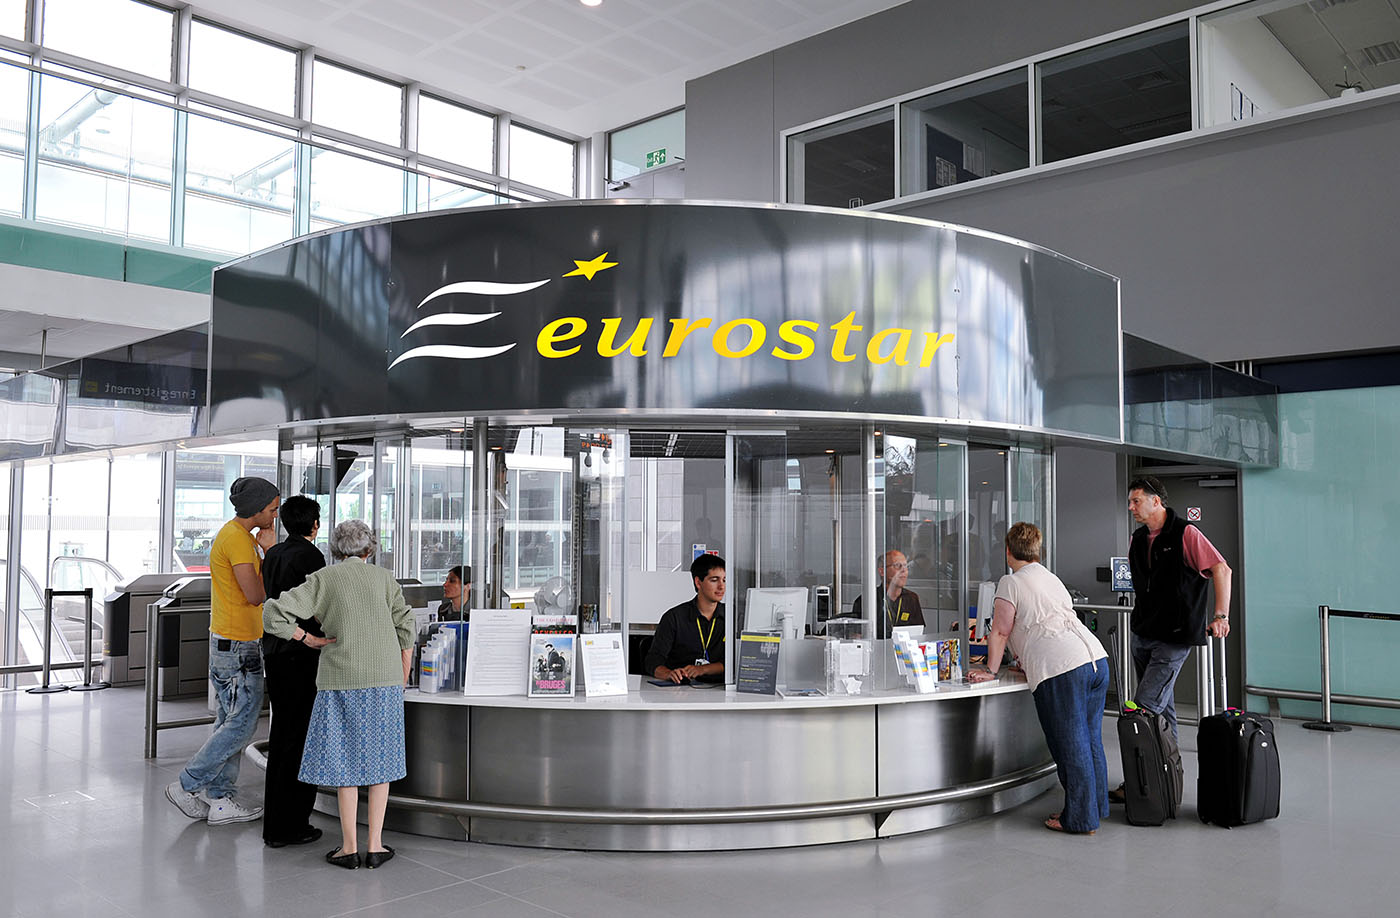 The Eurostar customer information desk at Ebbsfleet International train station in North Kent